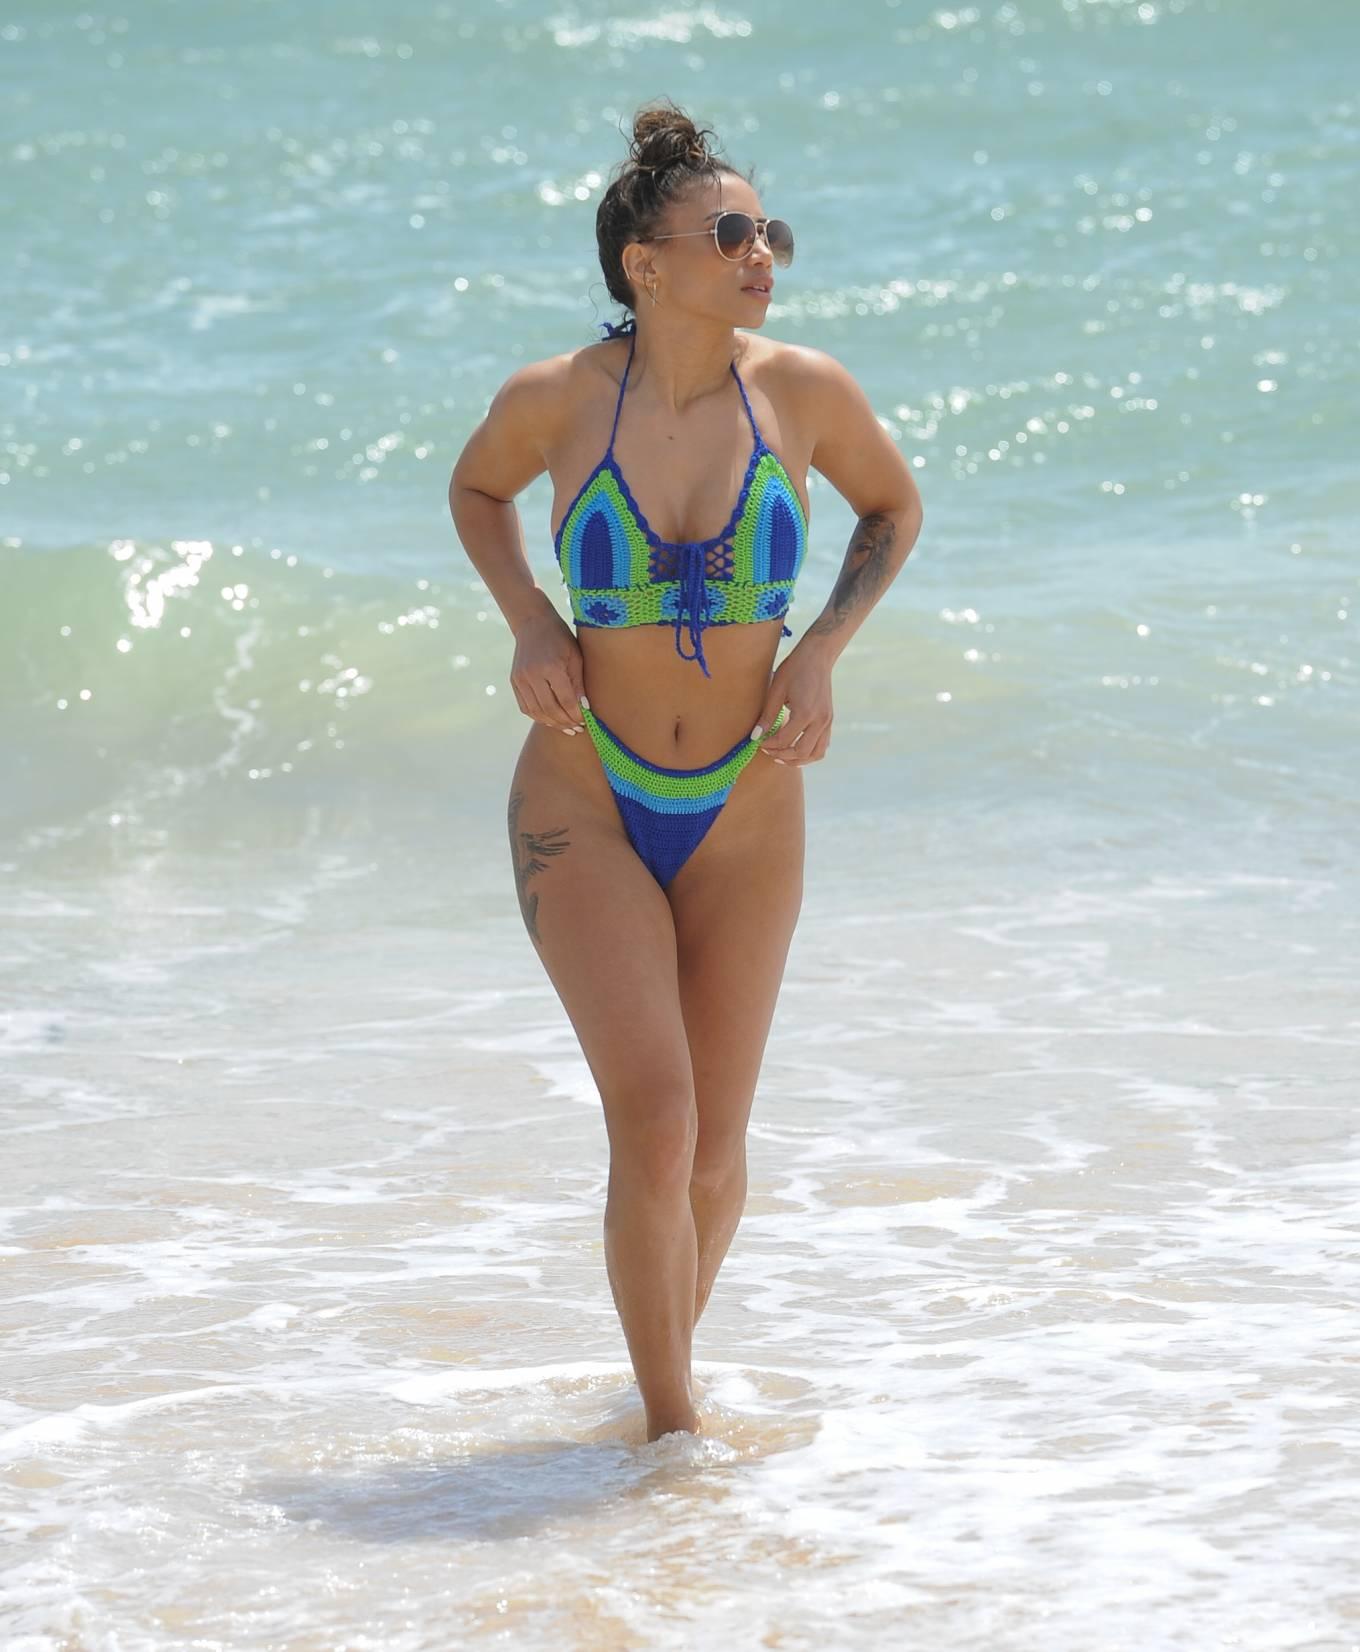 Kayleigh Morris 2020 : Kayleigh Morris in Bikini 2020-03